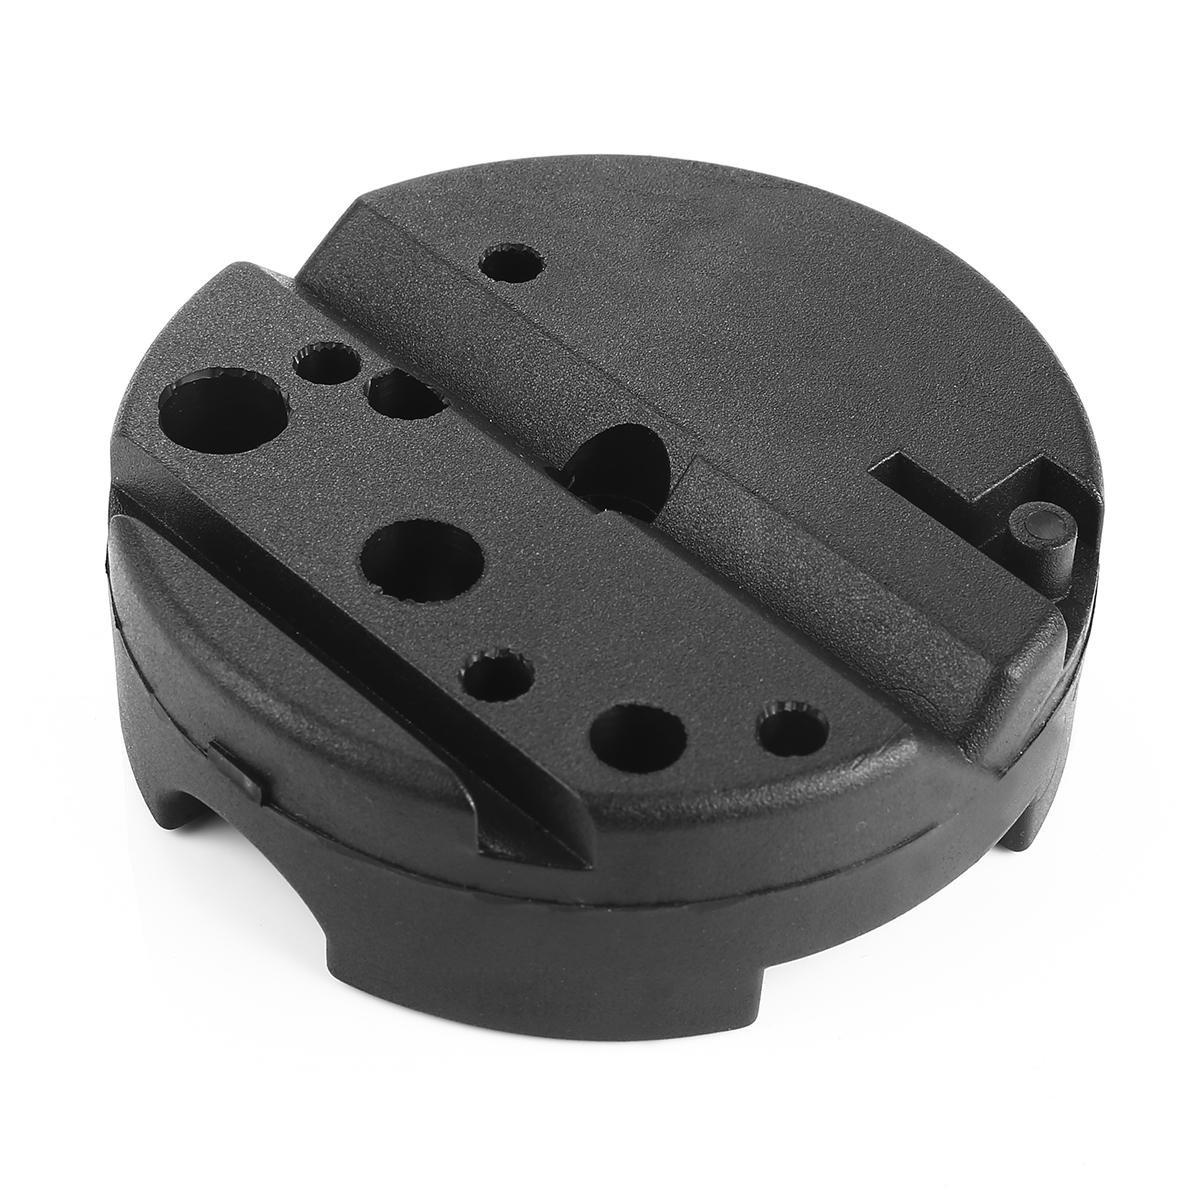 Magorui Universal Firearm Durable Bench Block Gunsmith Handgun